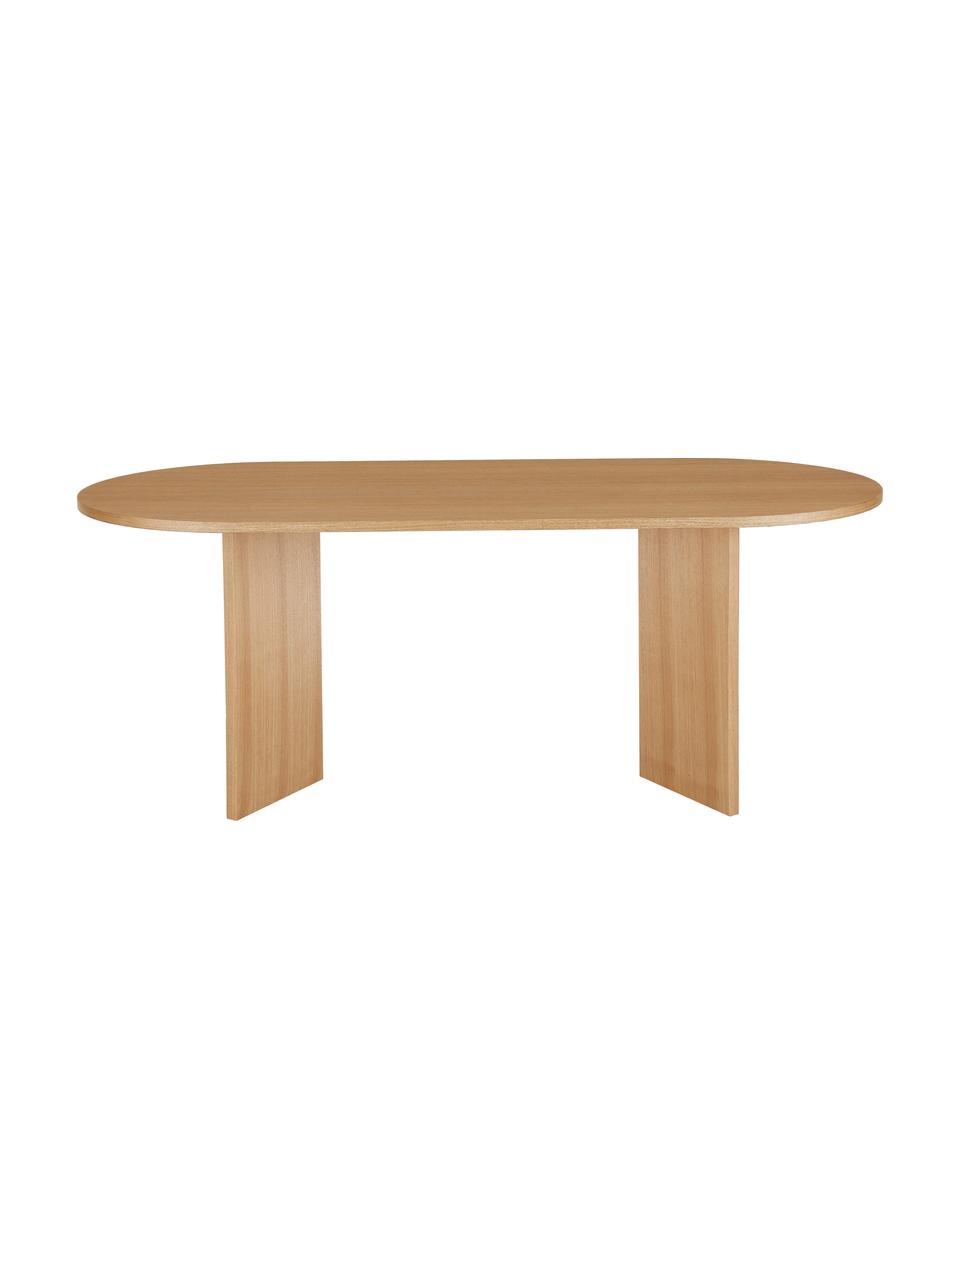 Mesa de comedor ovalada Joni, Tablero de fibras de densidad media (MDF) chapado en madera de fresno pintado, Fresno, An 200 x F 90 cm